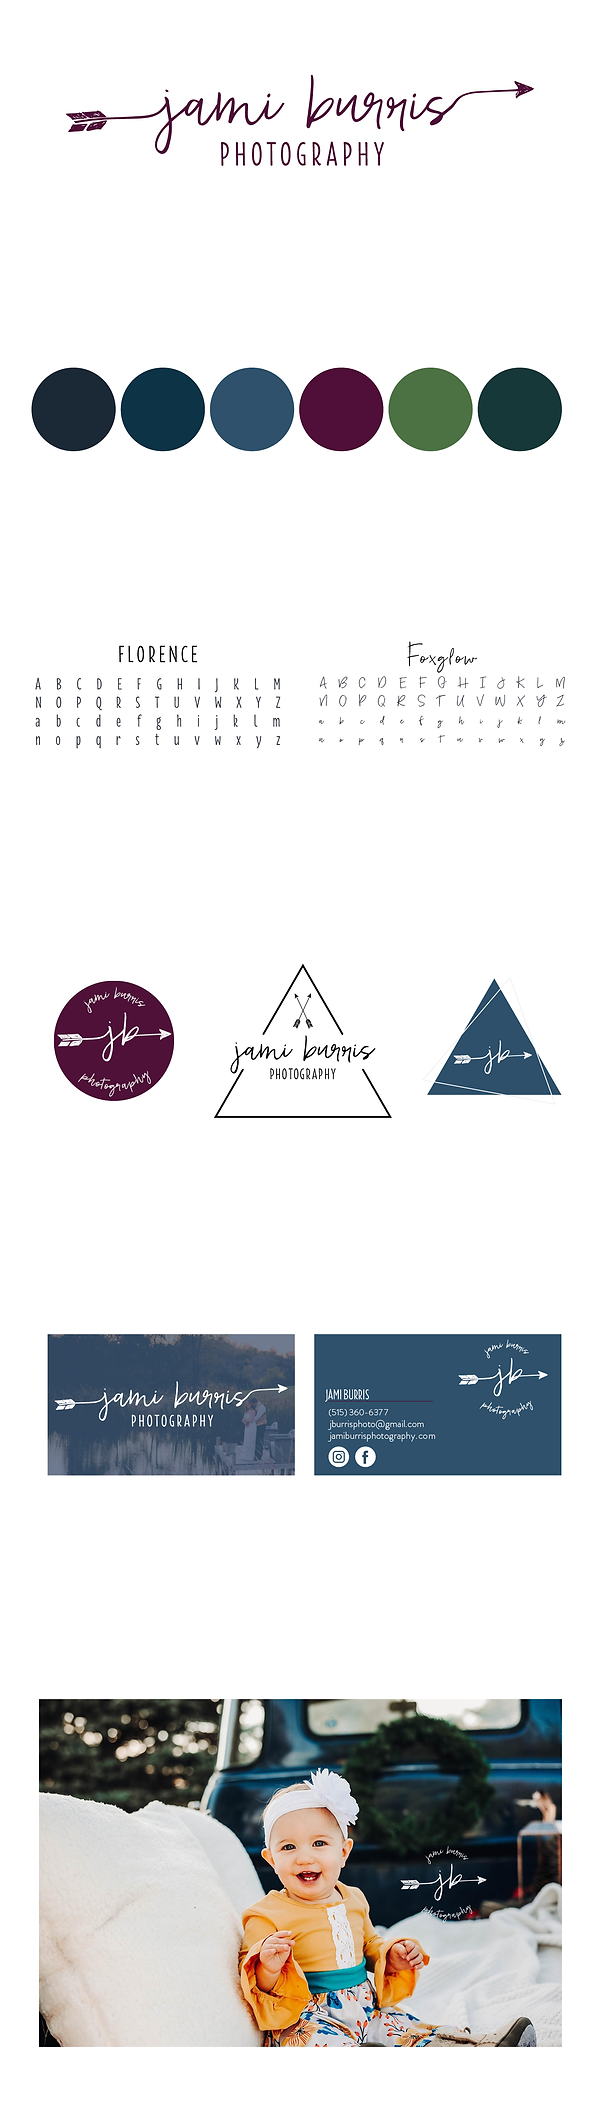 BDC_Website_FeaturedProject_JamiBurrisPh